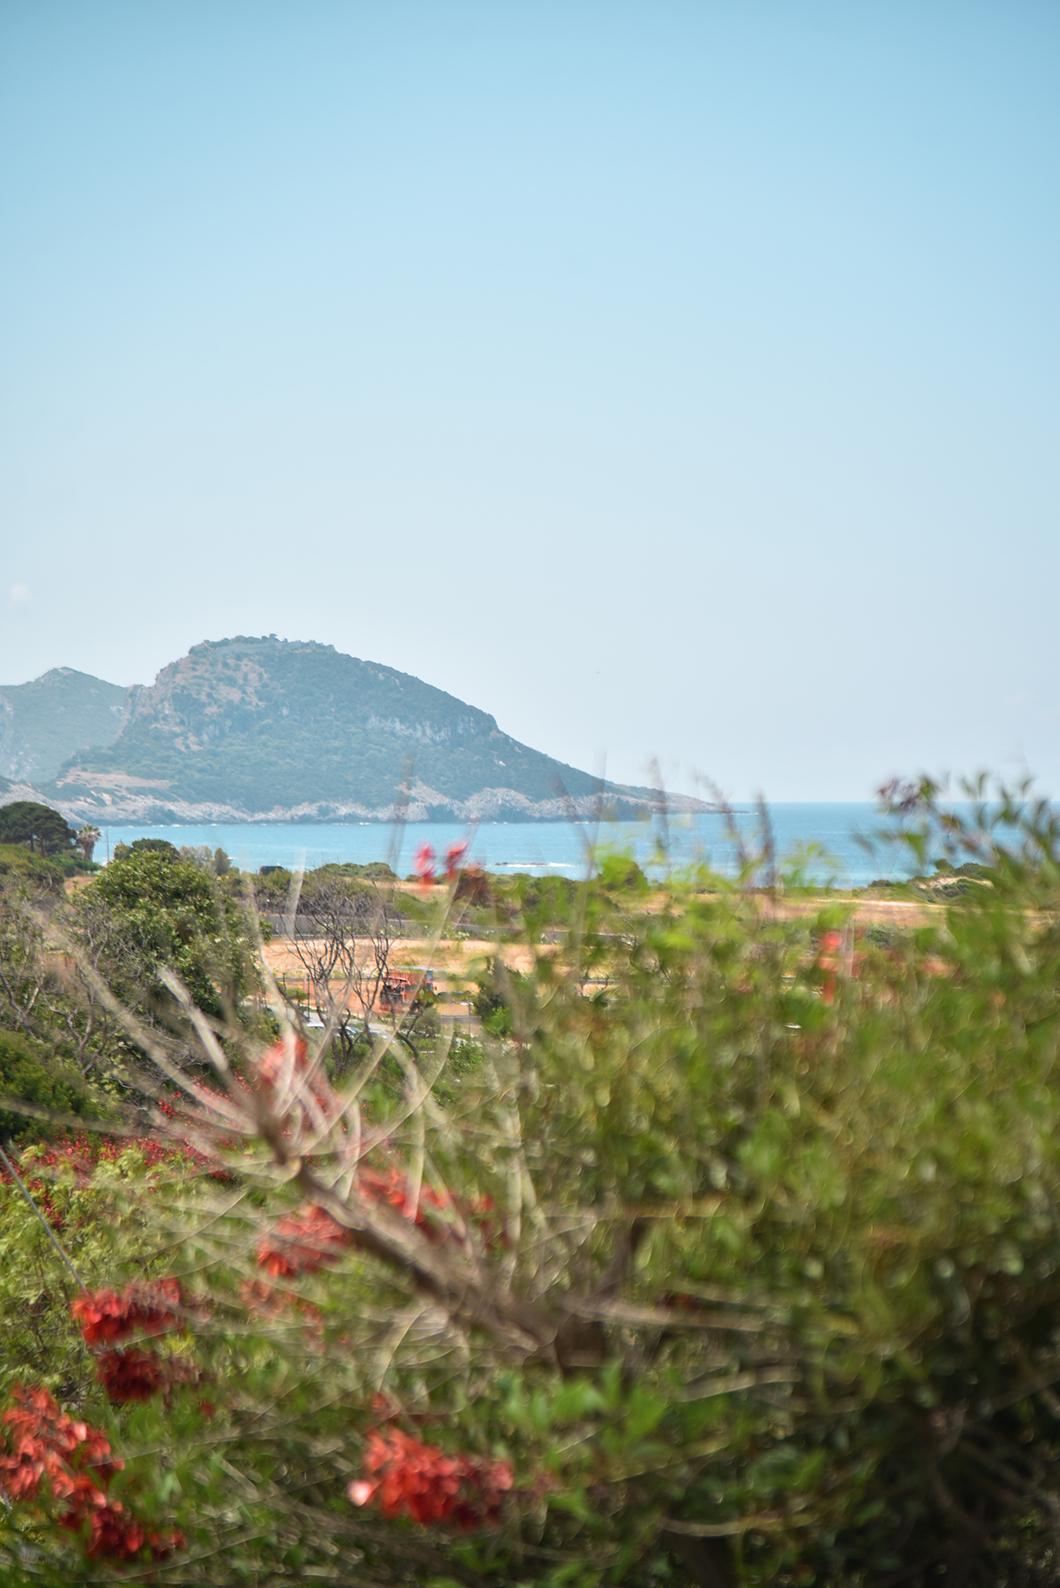 Le Westin Resort, belle adresse sur la Costa Navarino